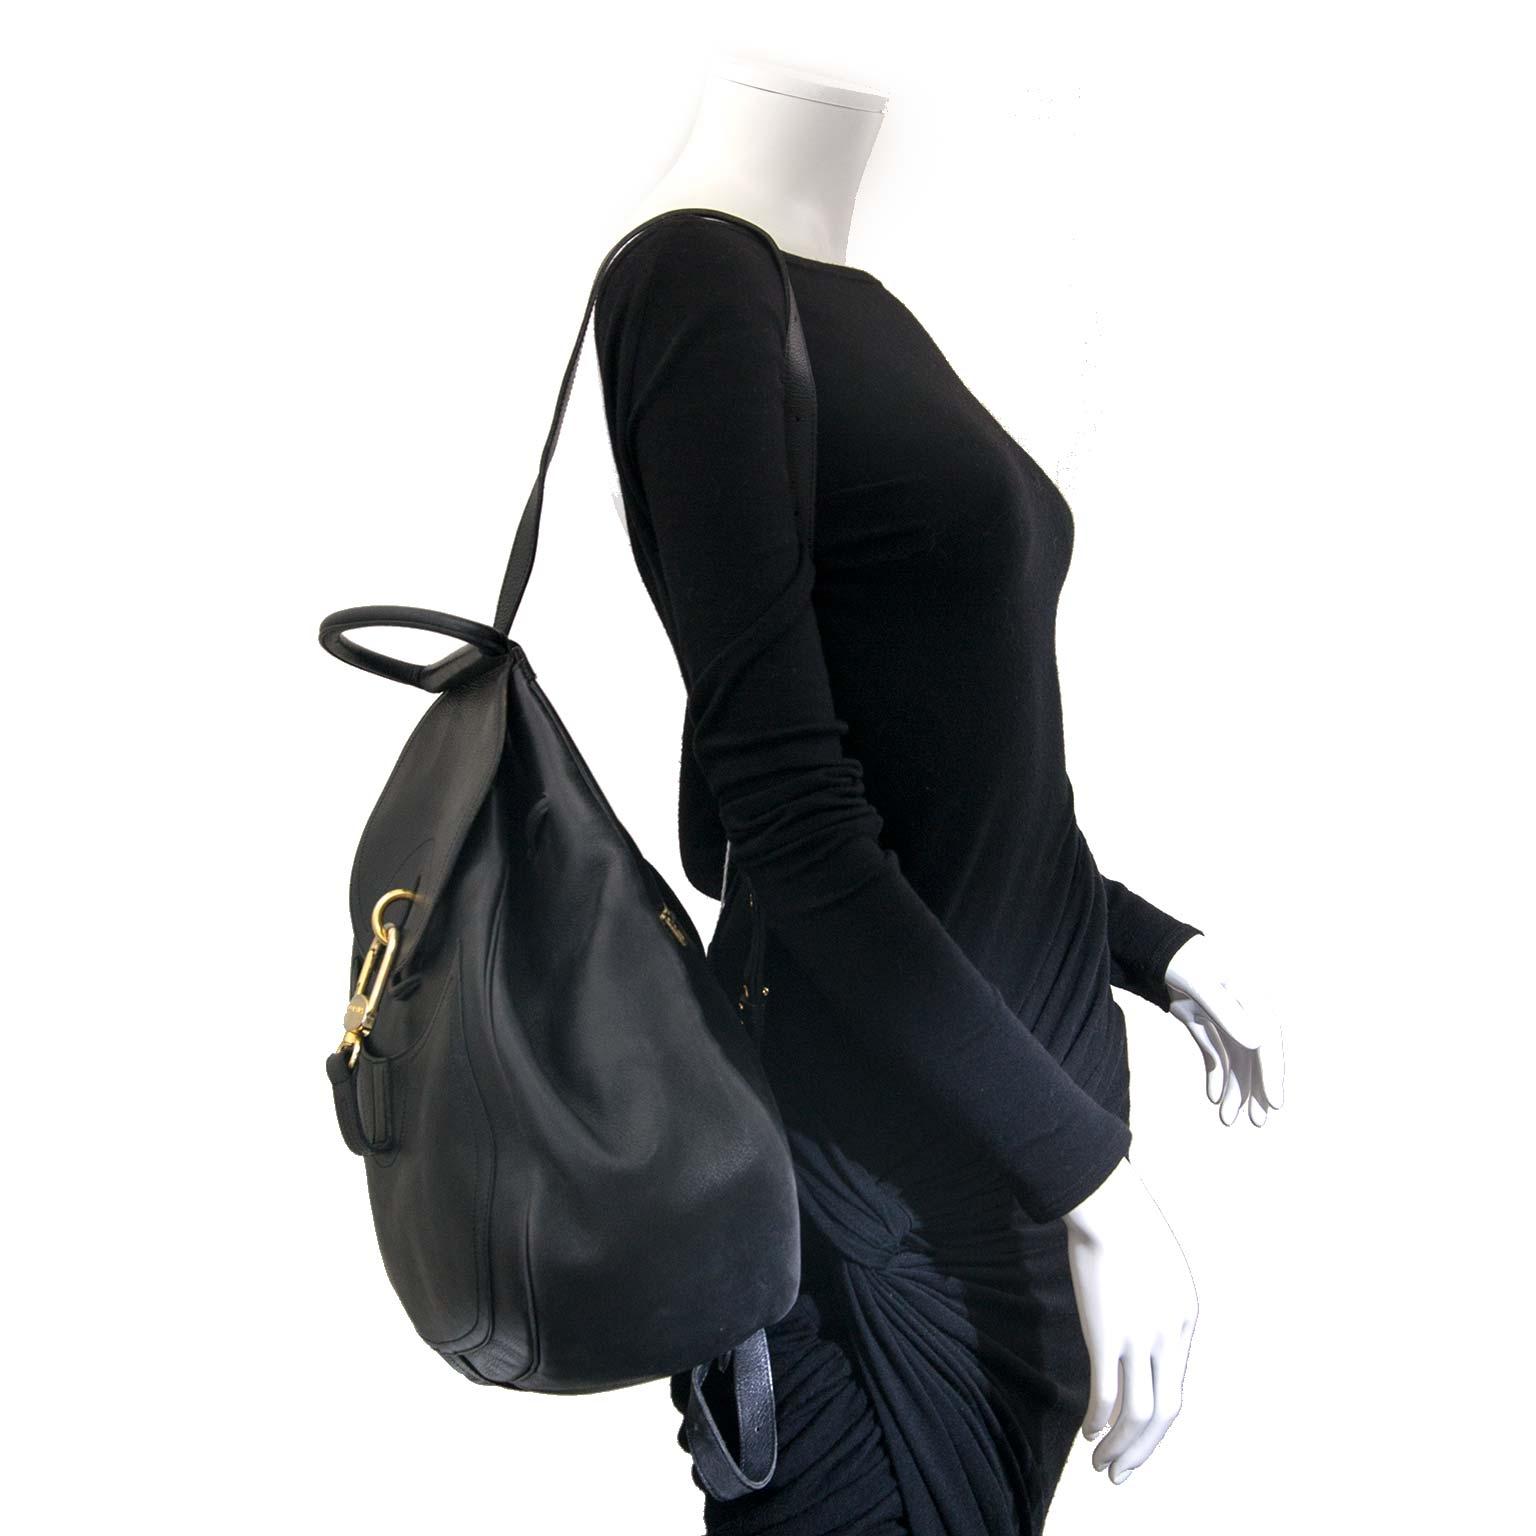 delvaux black cerceau backpack now for sale at labellov vintage fashion webshop belgium